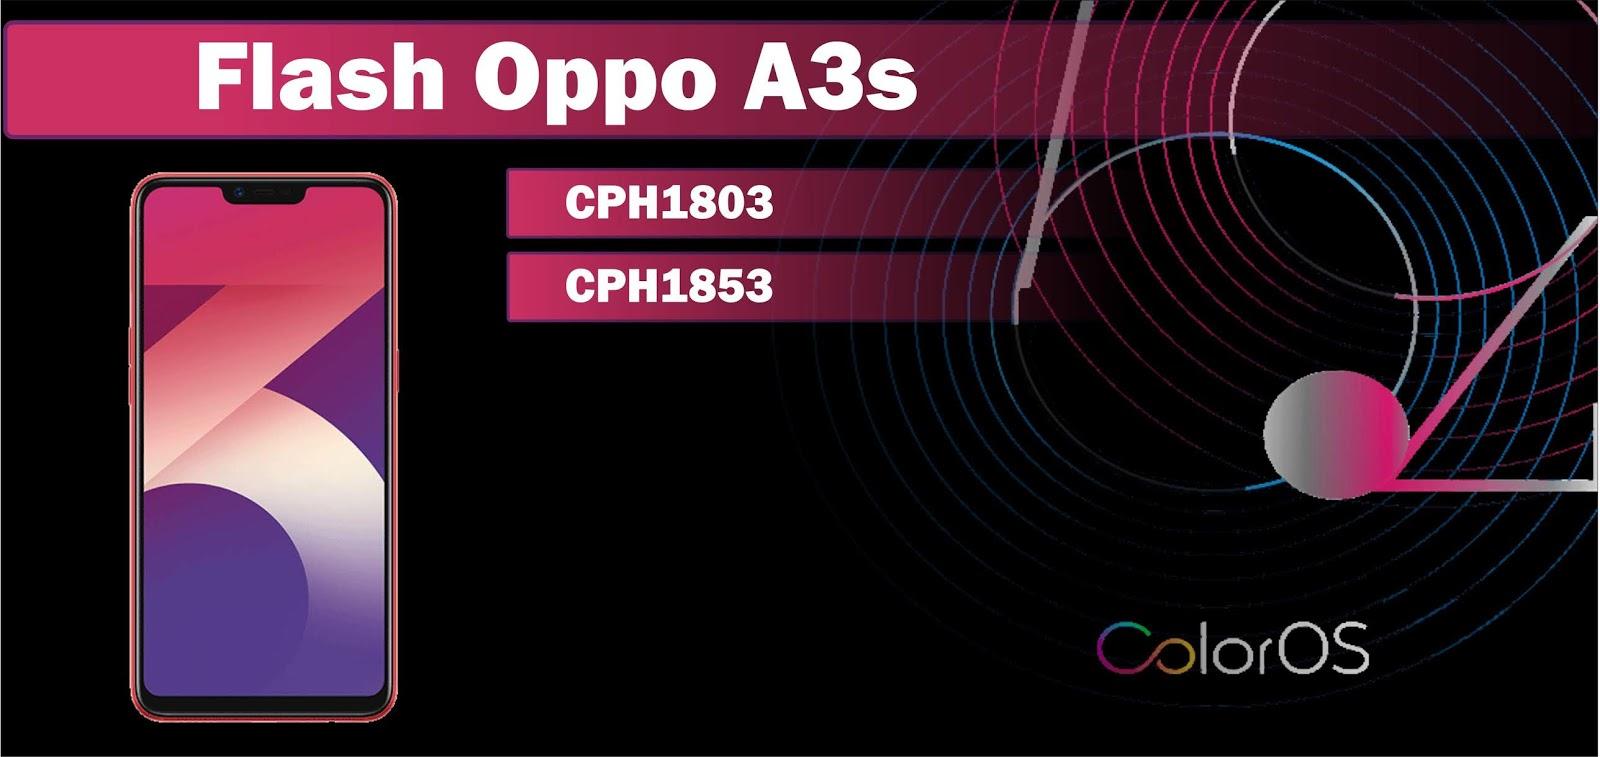 Cara Flash Oppo A3s CPH1803 dan CPH1853 Botloop 100